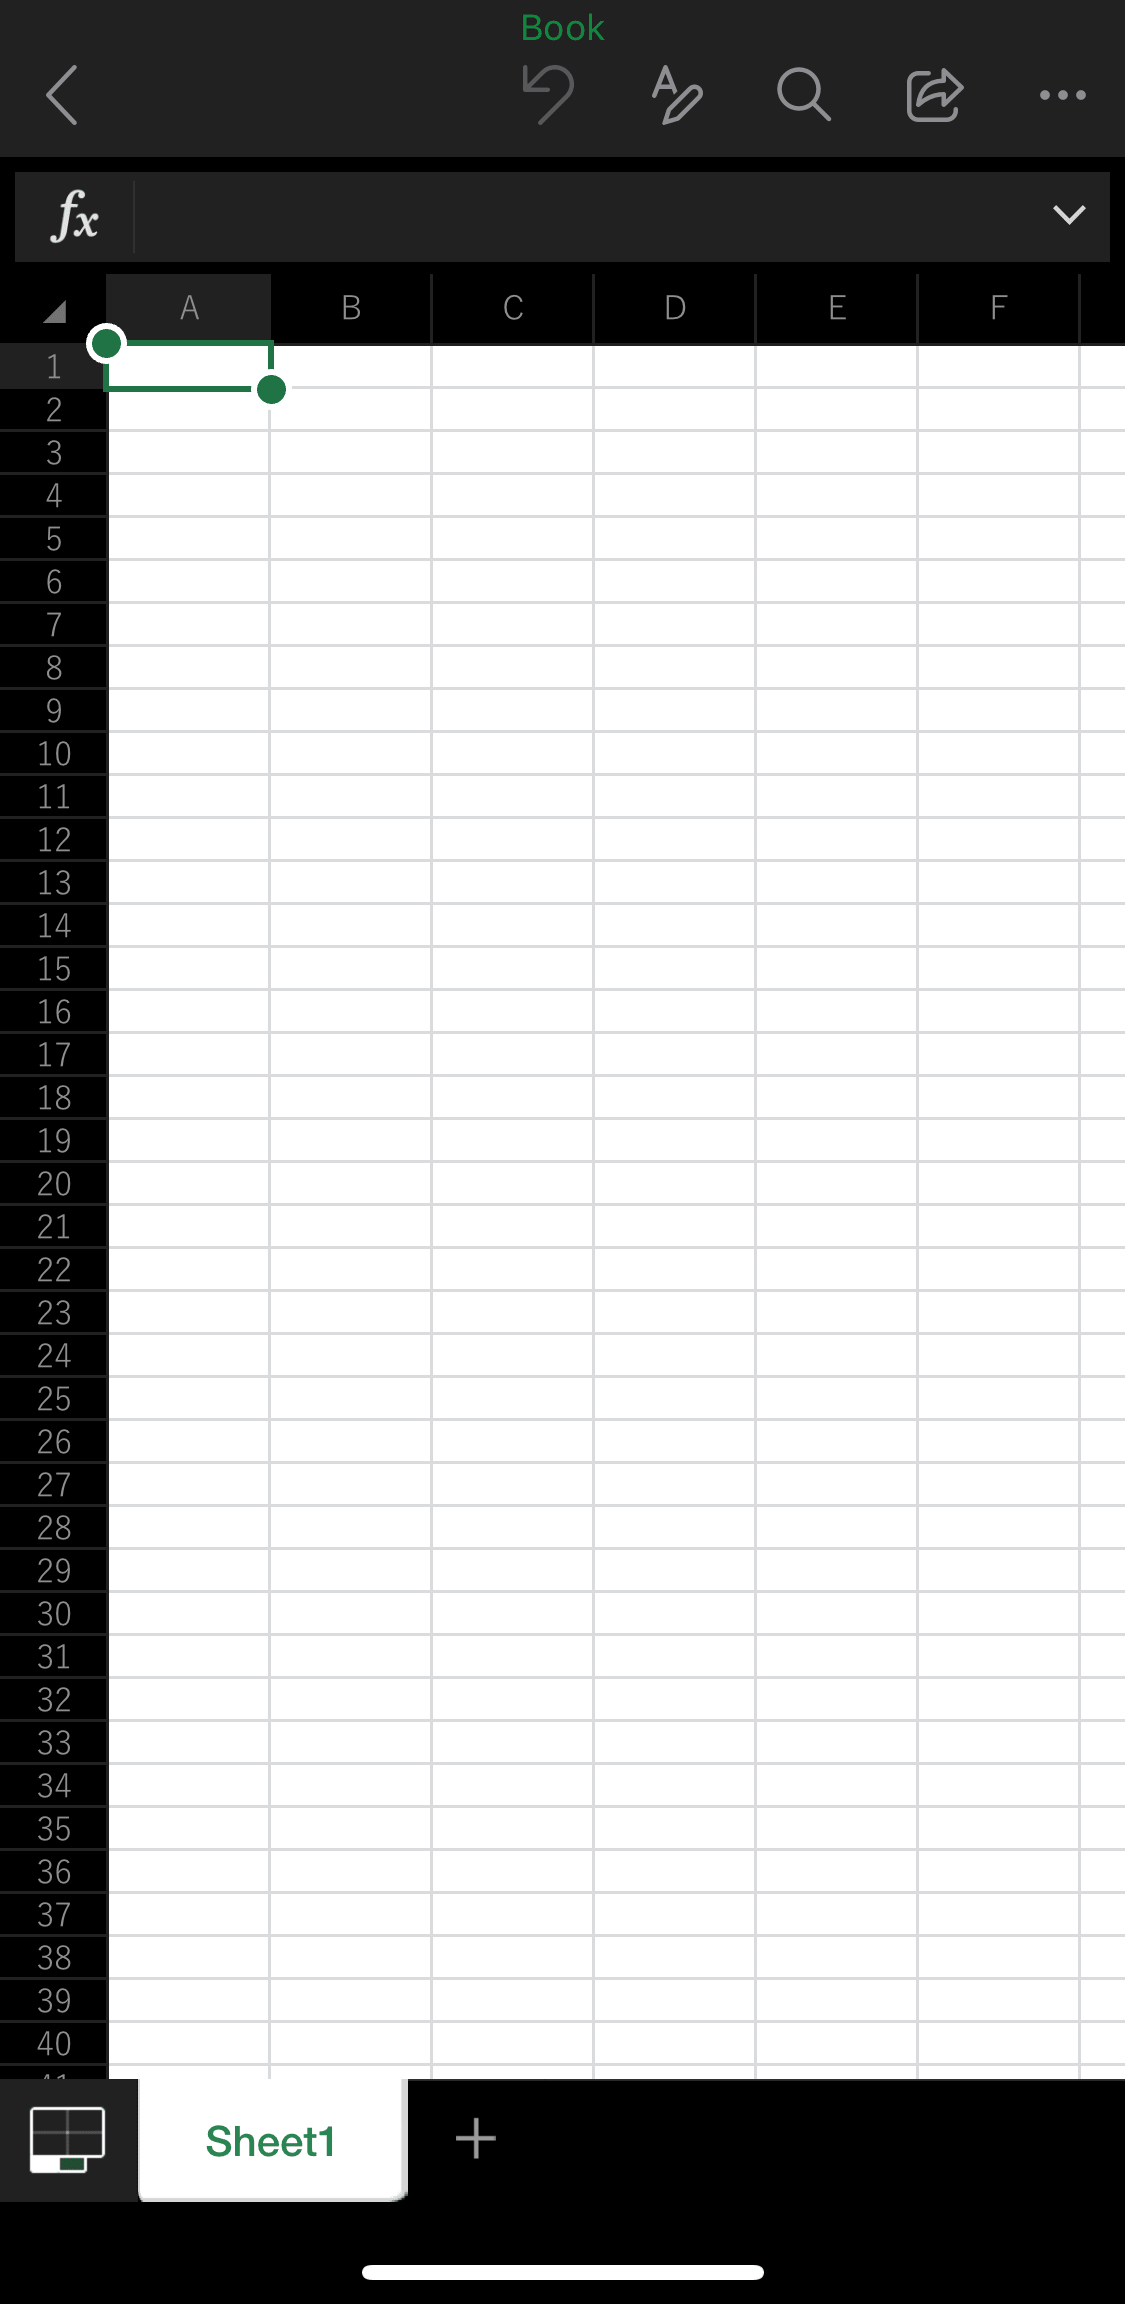 iPhoneでのエクセルアプリの使い方・編集方法・保存方法27